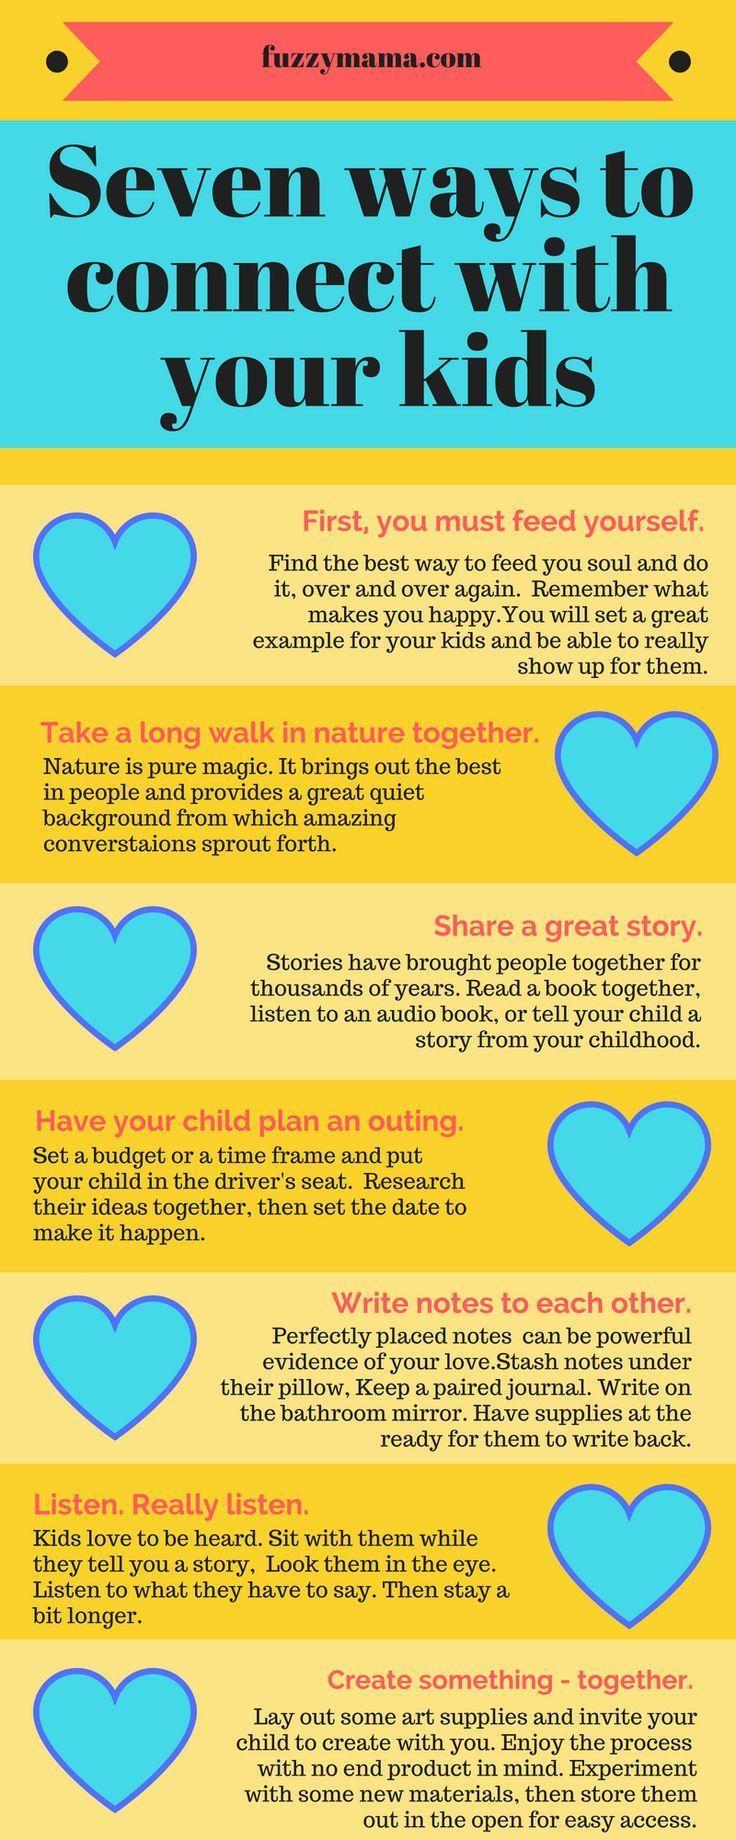 68 best simplicity parenting - rhythm images on Pinterest | Babys ...